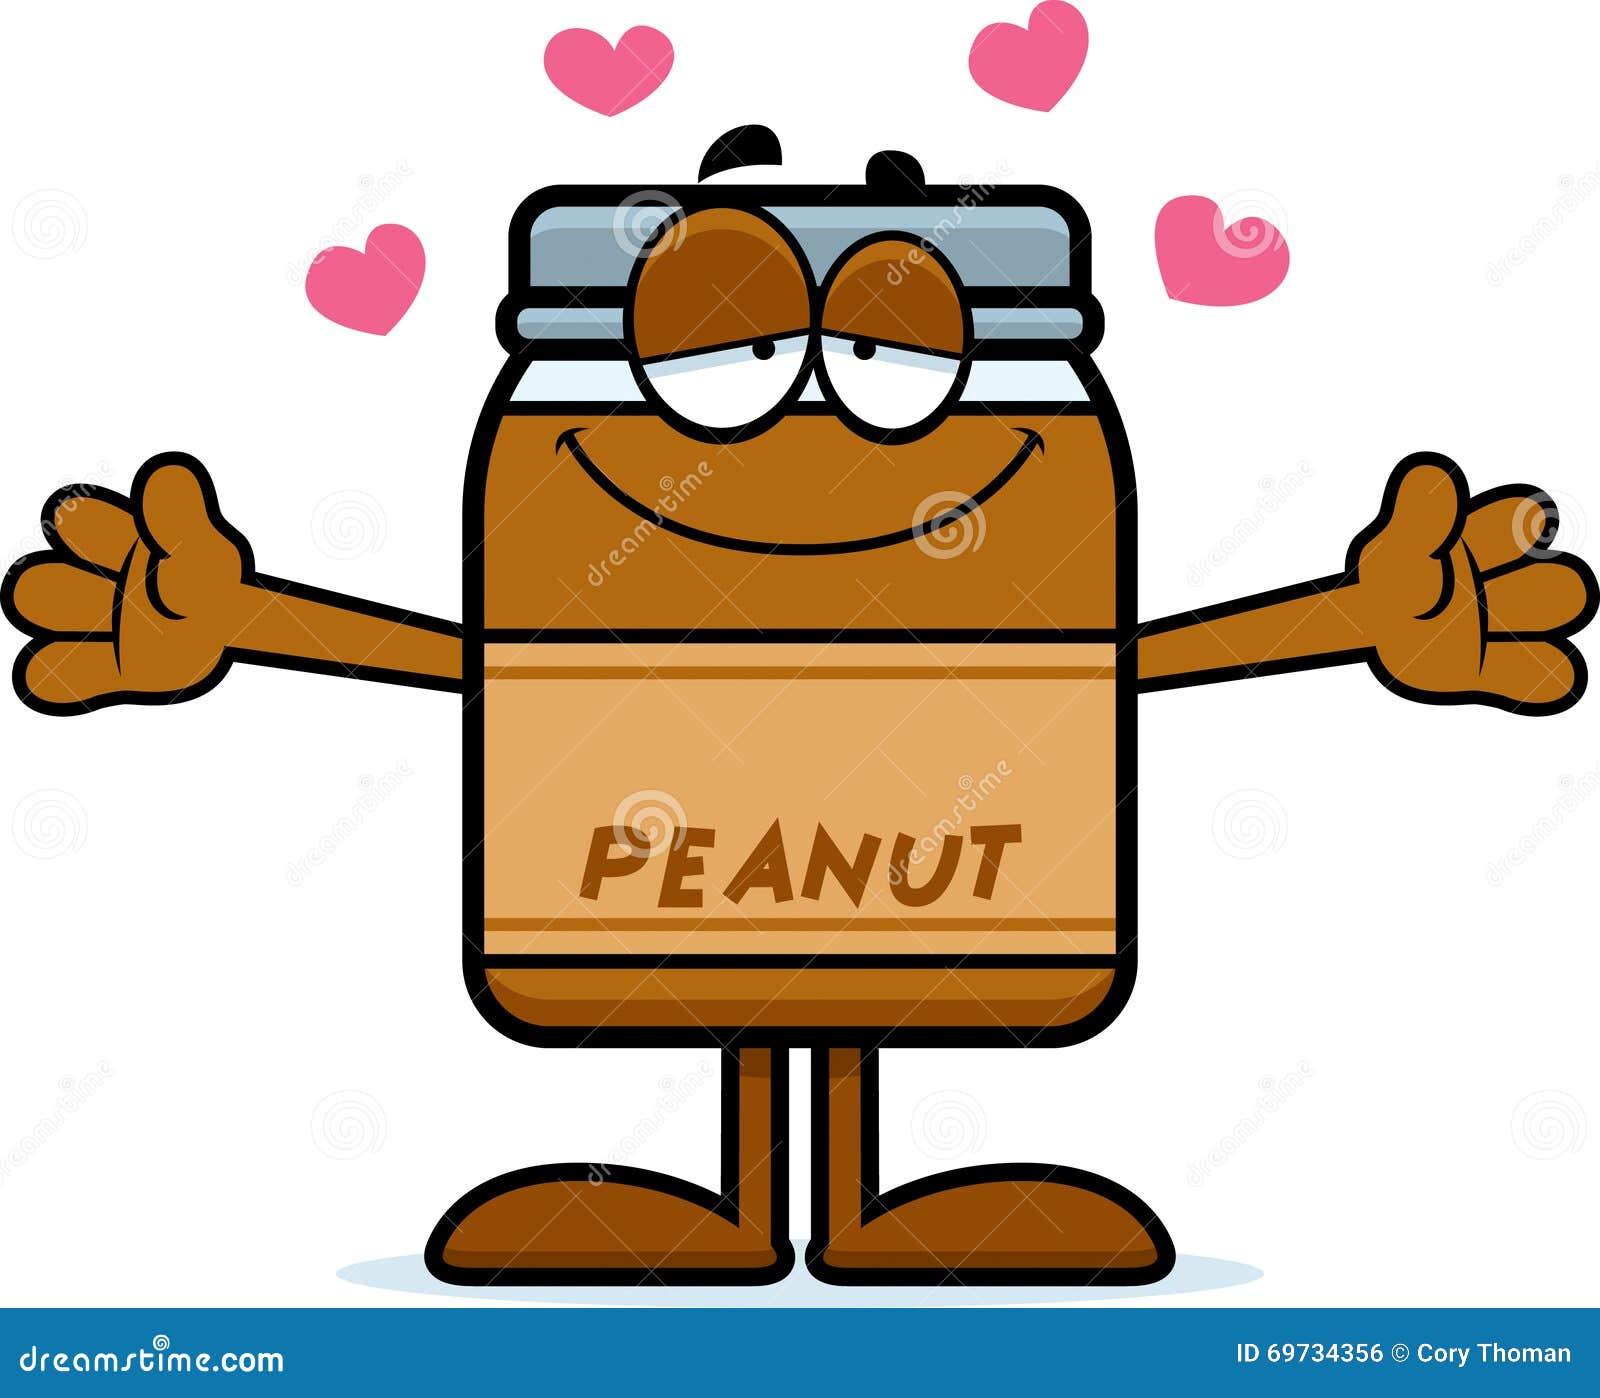 Peanut butter jar cartoon